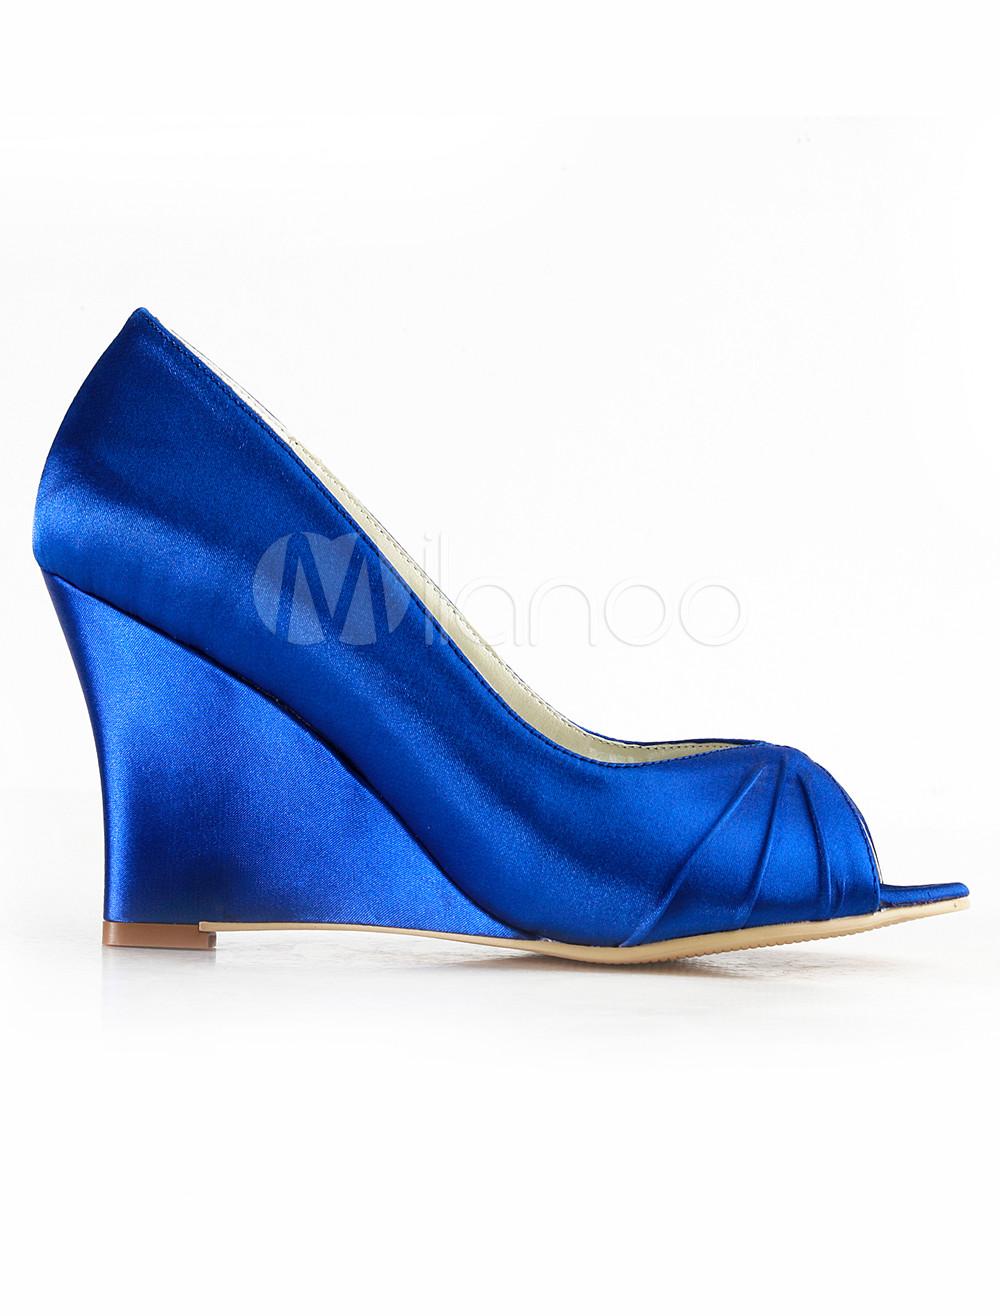 blue wedge heel peep toe bridal shoes milanoo